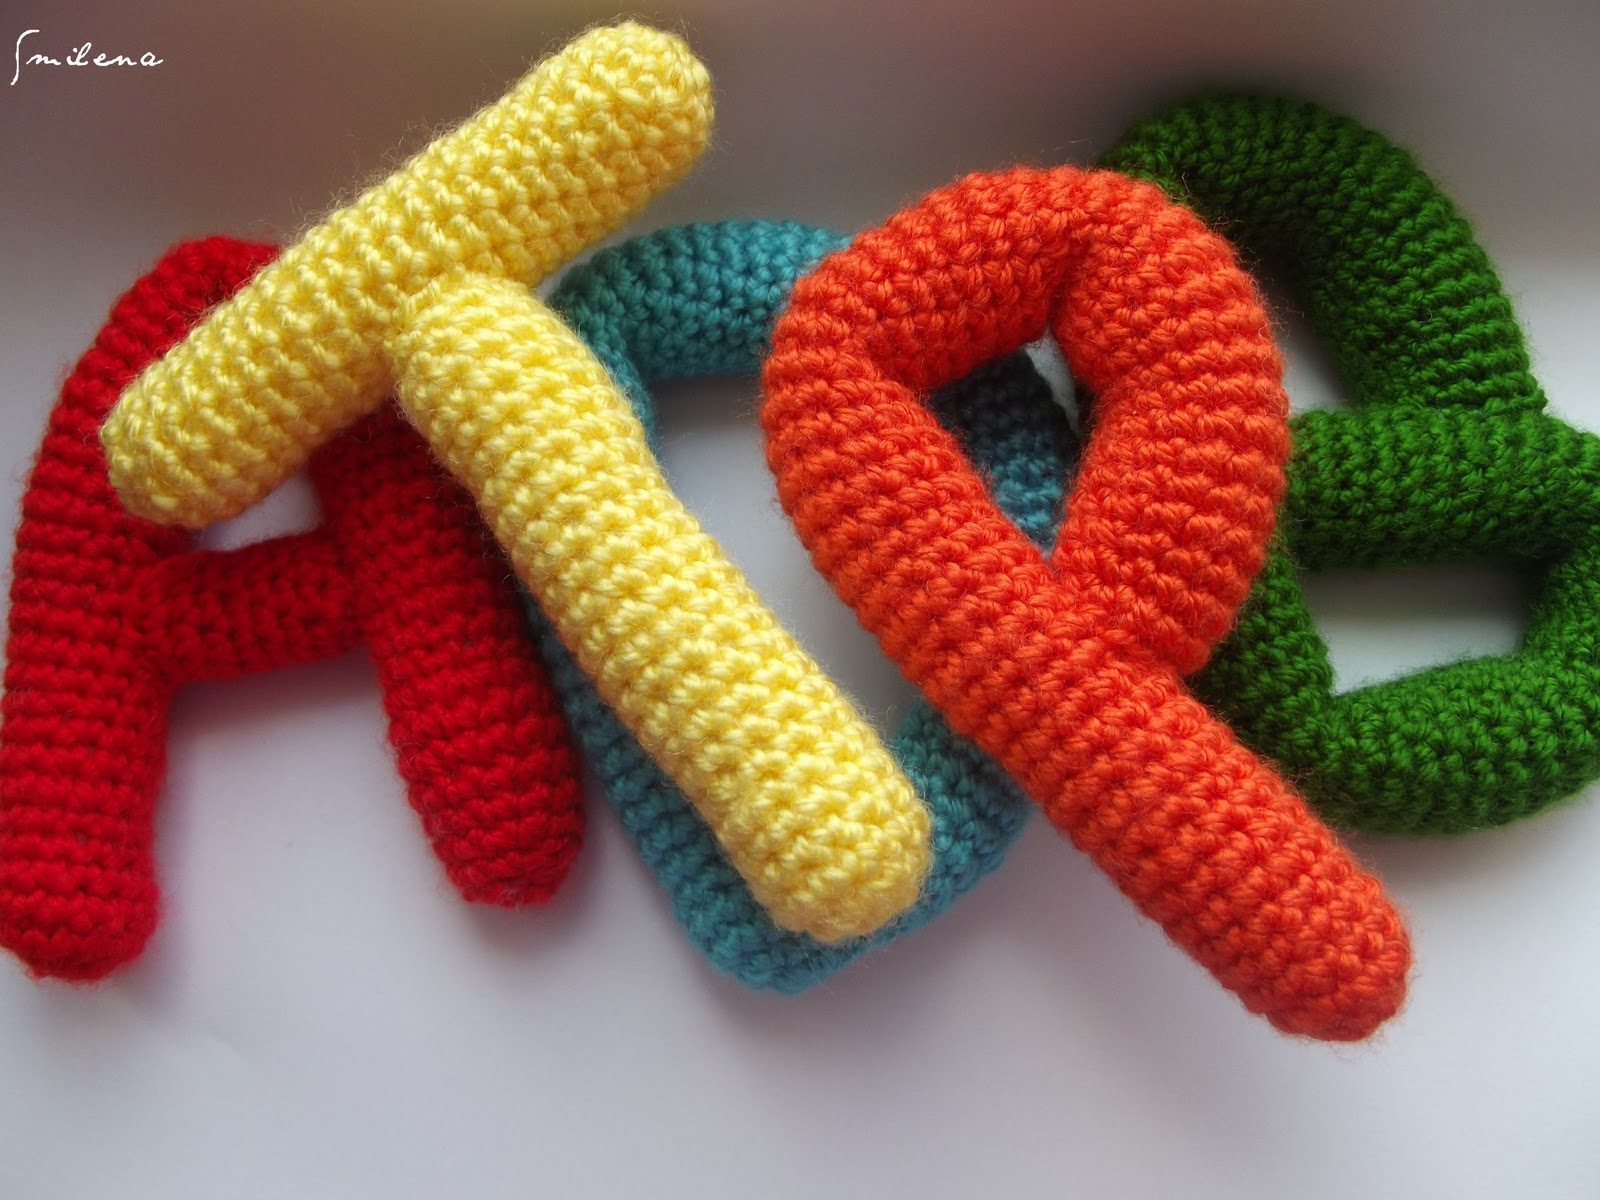 Amigurumi Harf Yapilisi : s m ? l e n a..: Amigurumi alfabe oruyorum :)))